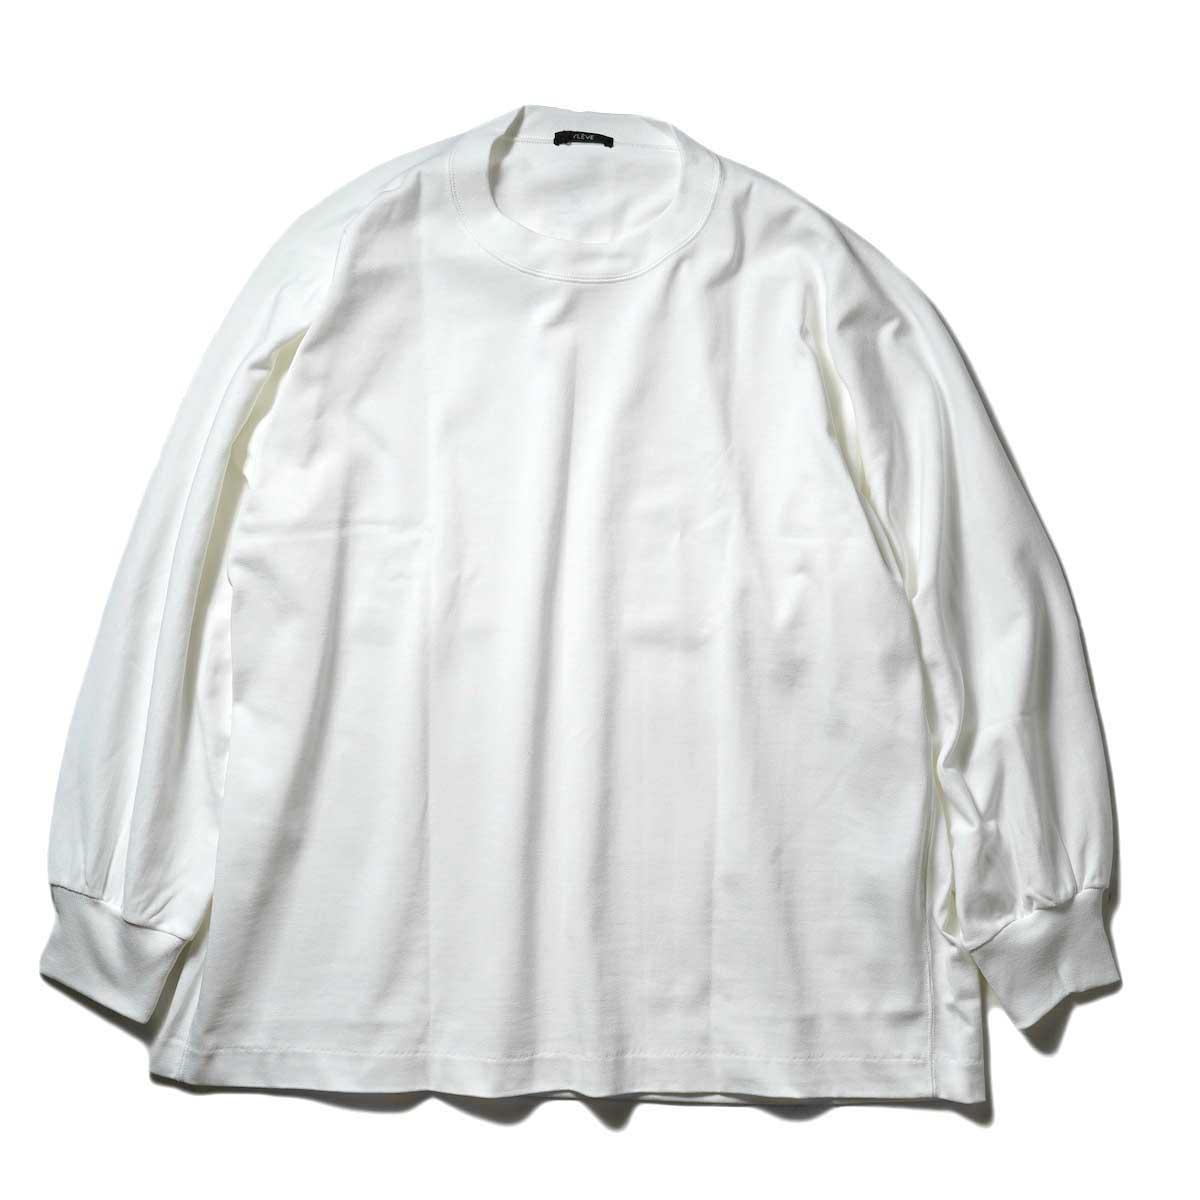 YLEVE / TWIST YARN COTTON BIG P/O (White)